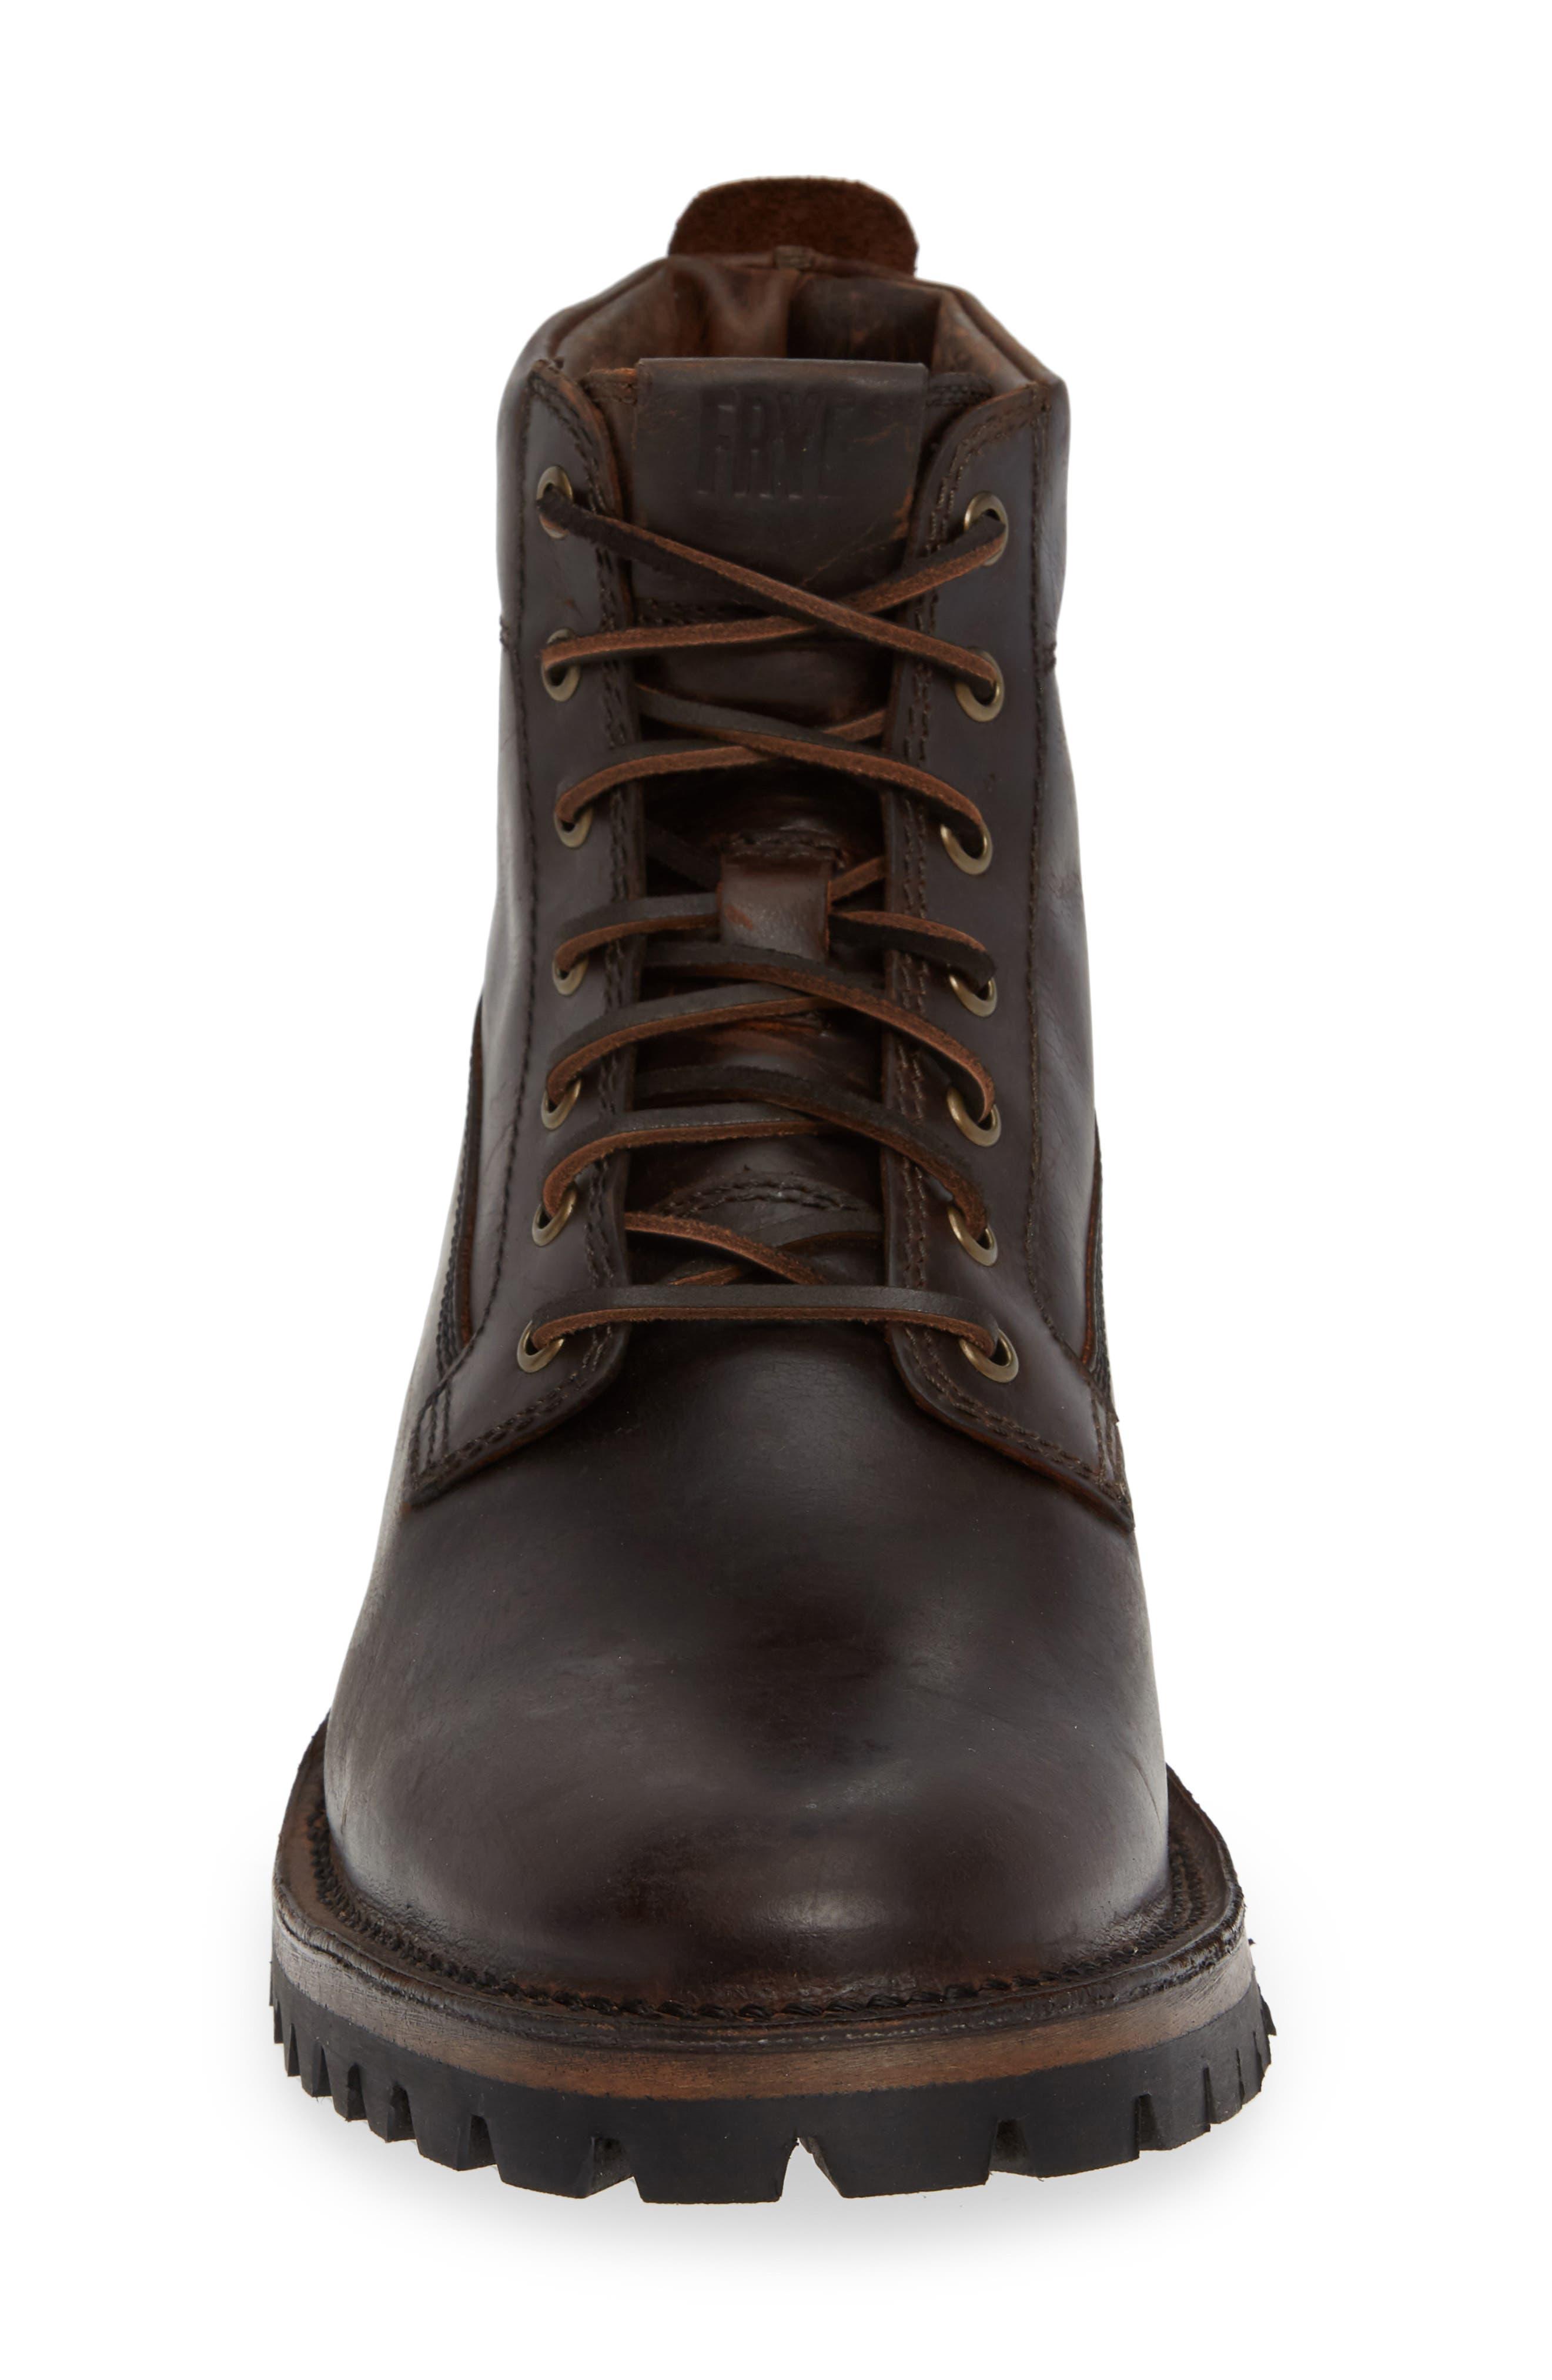 Union Plain Toe Boot,                             Alternate thumbnail 4, color,                             DARK BROWN